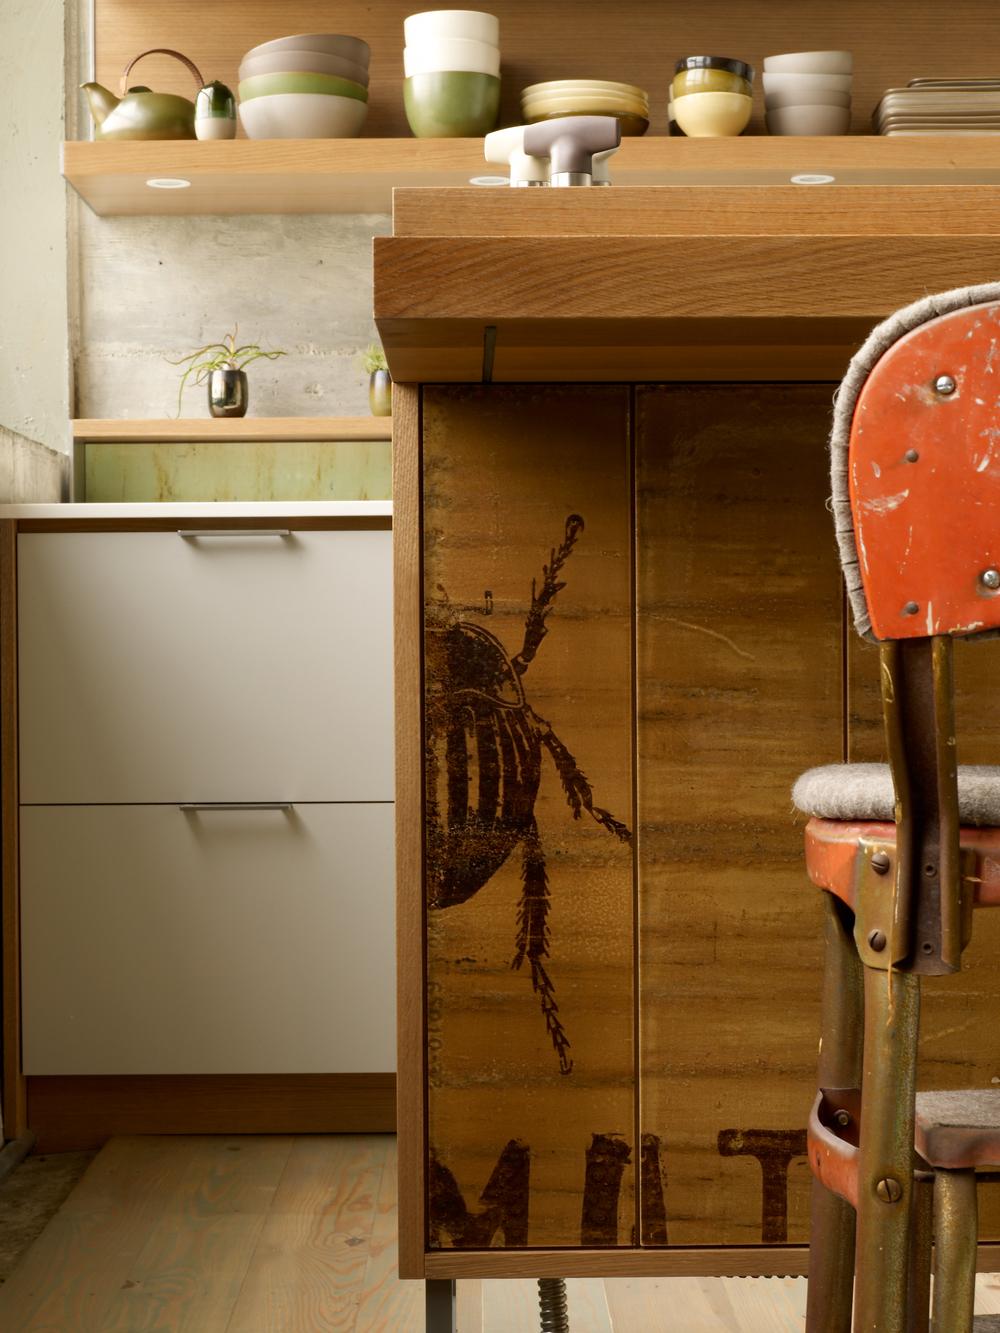 zamora-lo-kitchen-00049.jpg